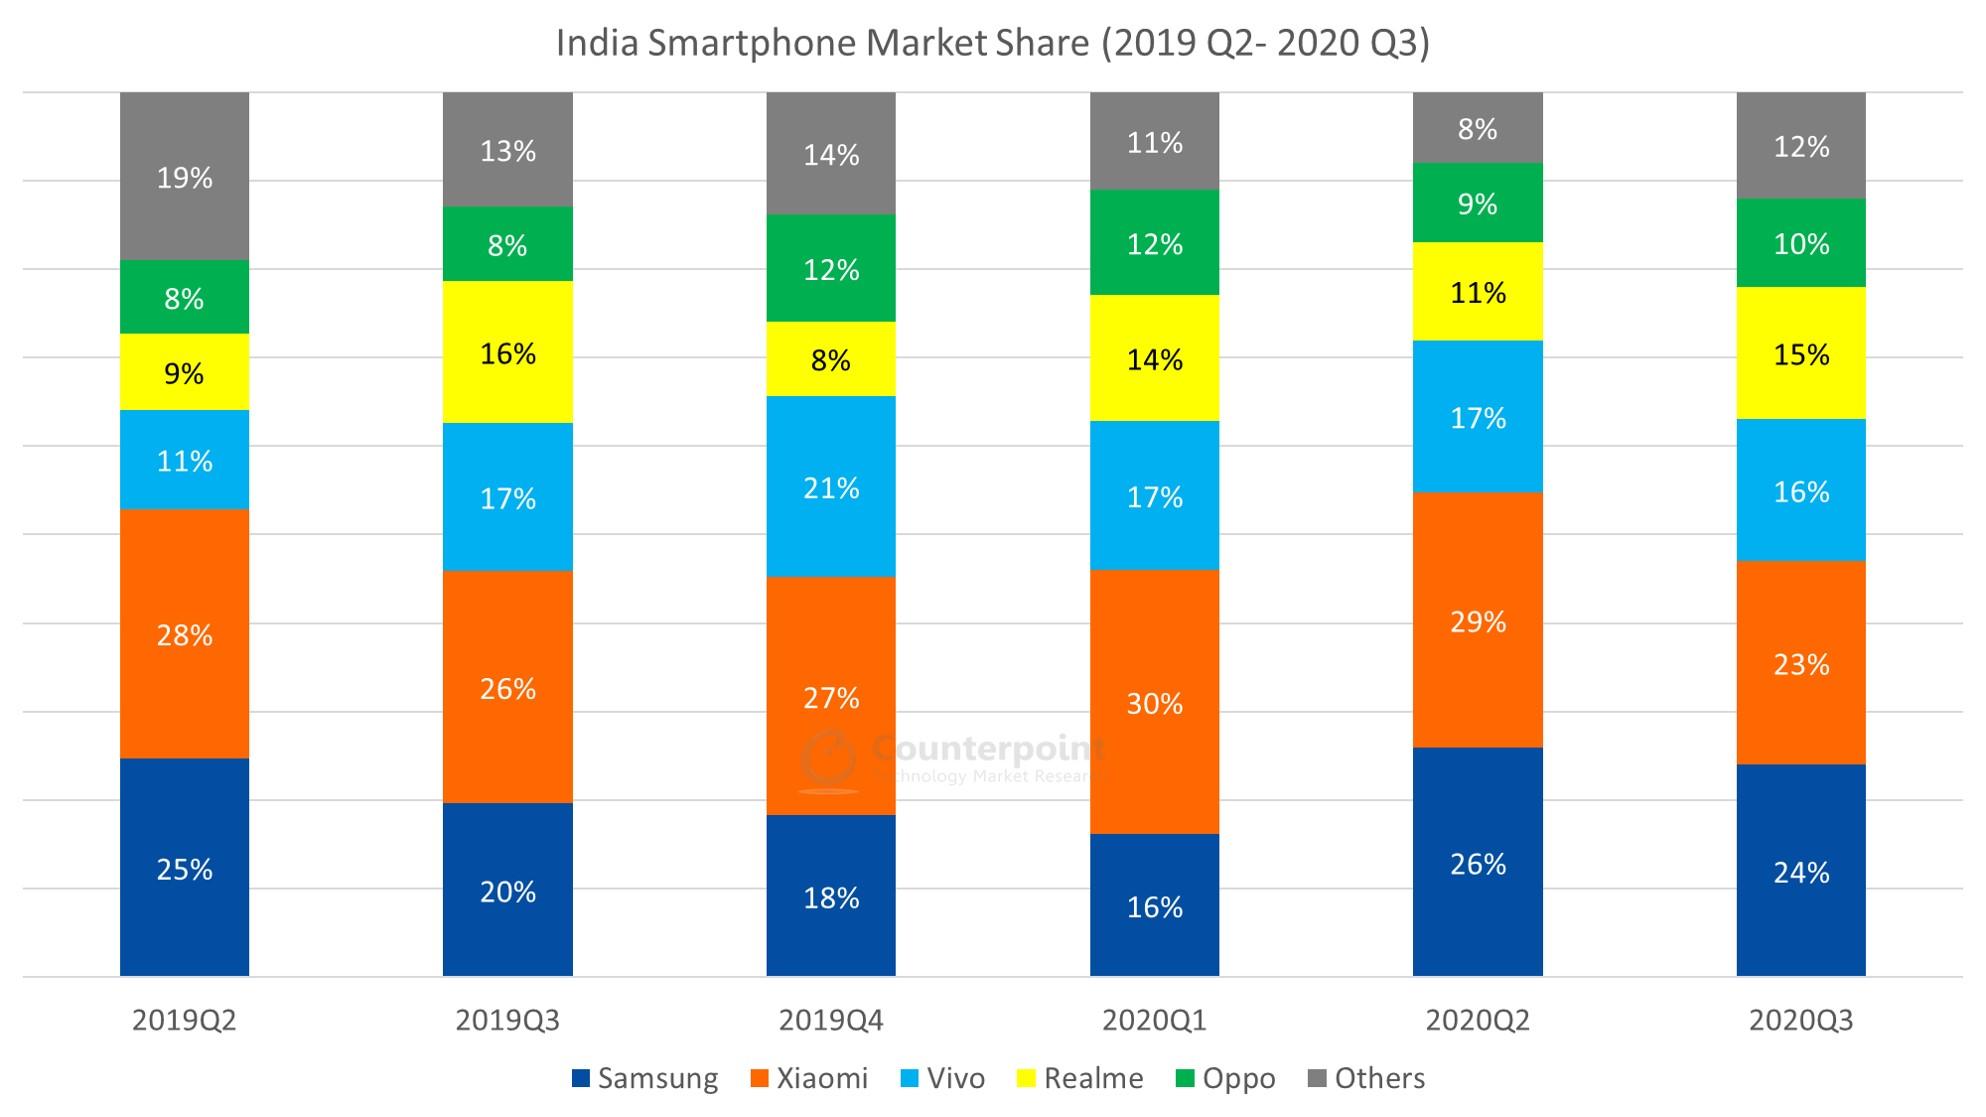 India-Smartphone-Market-Share-Q2-2019-Q3-2020